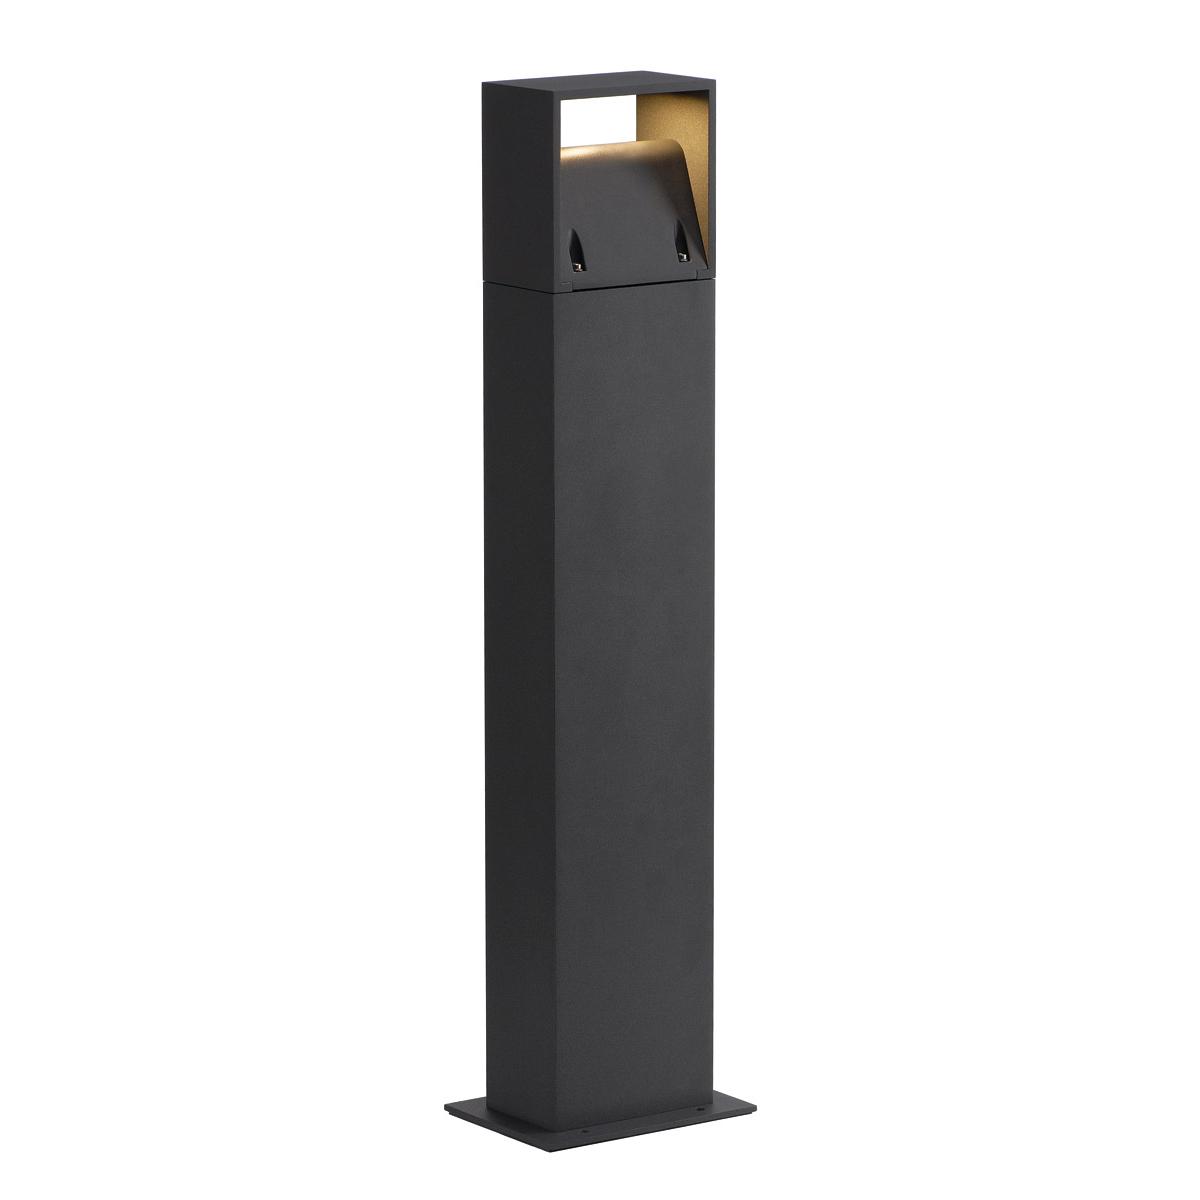 slv 232125 logs 70 stehleuchte eckig anthrazit 6w led warmweiss. Black Bedroom Furniture Sets. Home Design Ideas